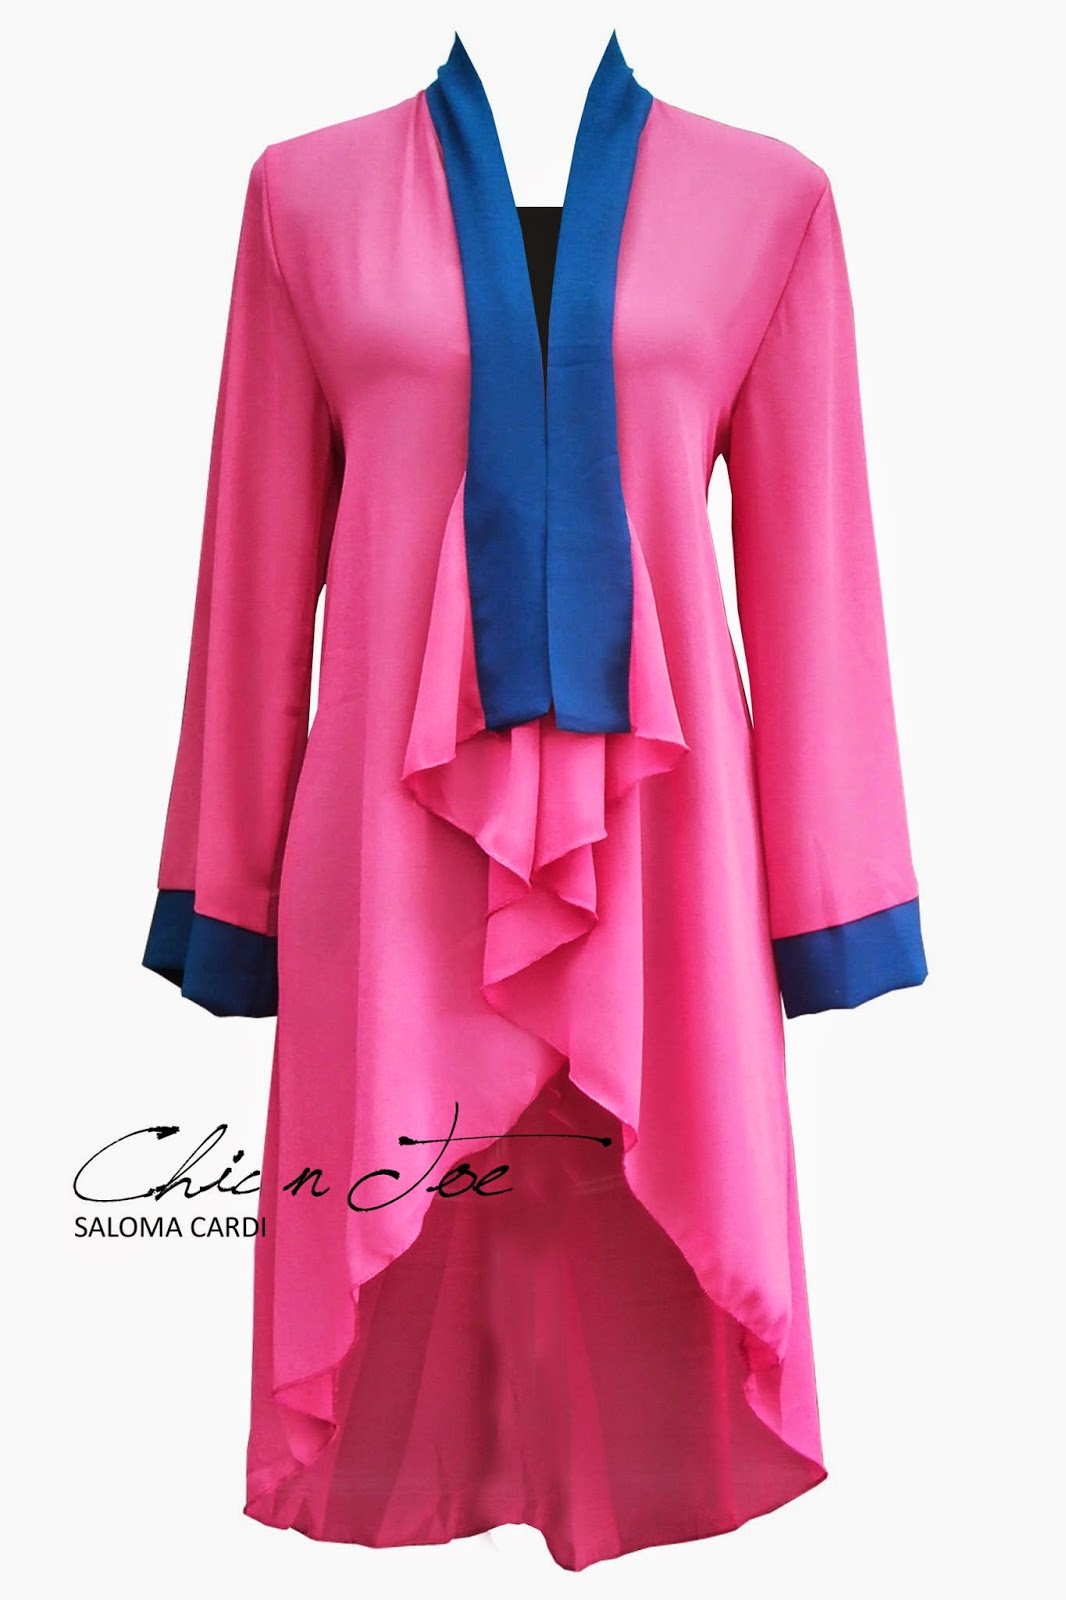 Baju Kebaya Terbaru 2016 Kimono Saloma